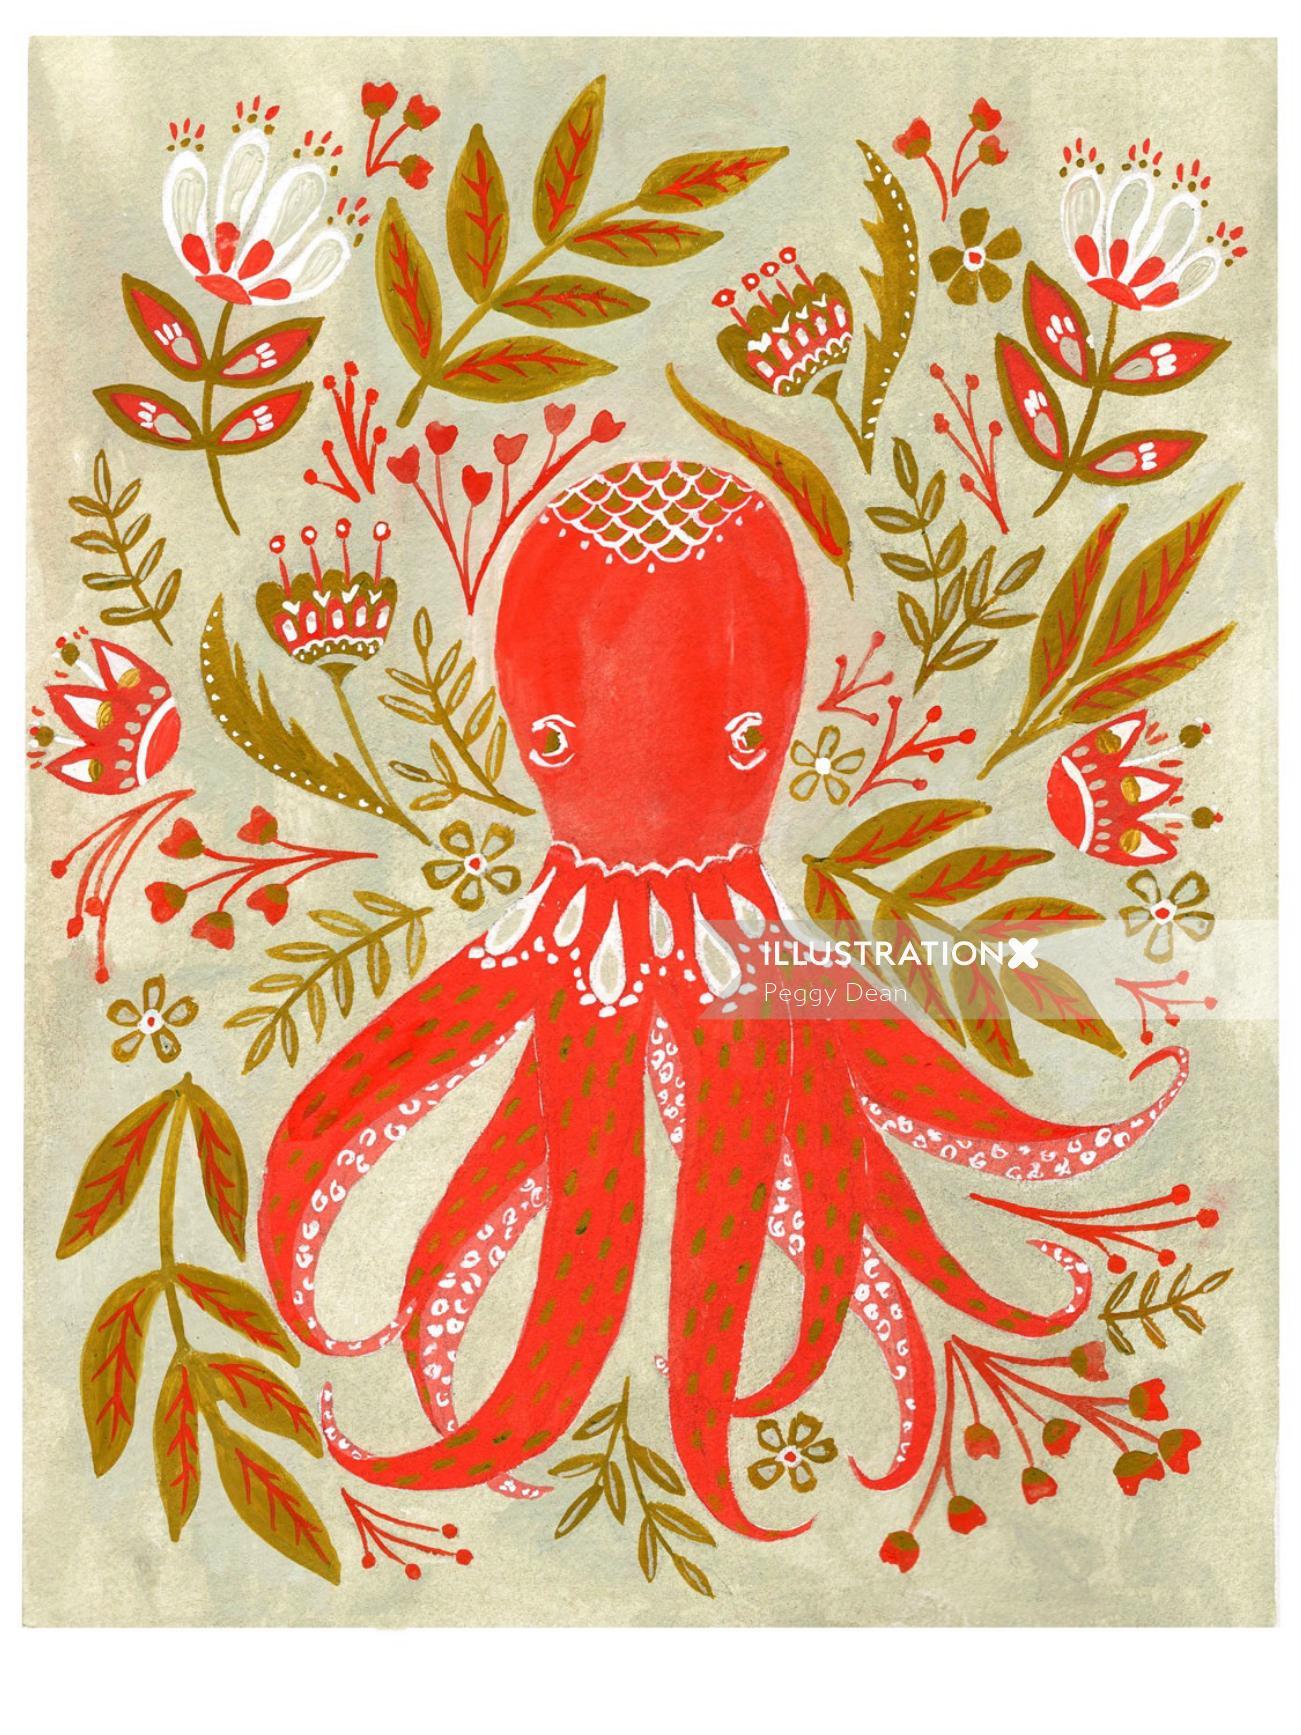 Folk art octopus in gouache